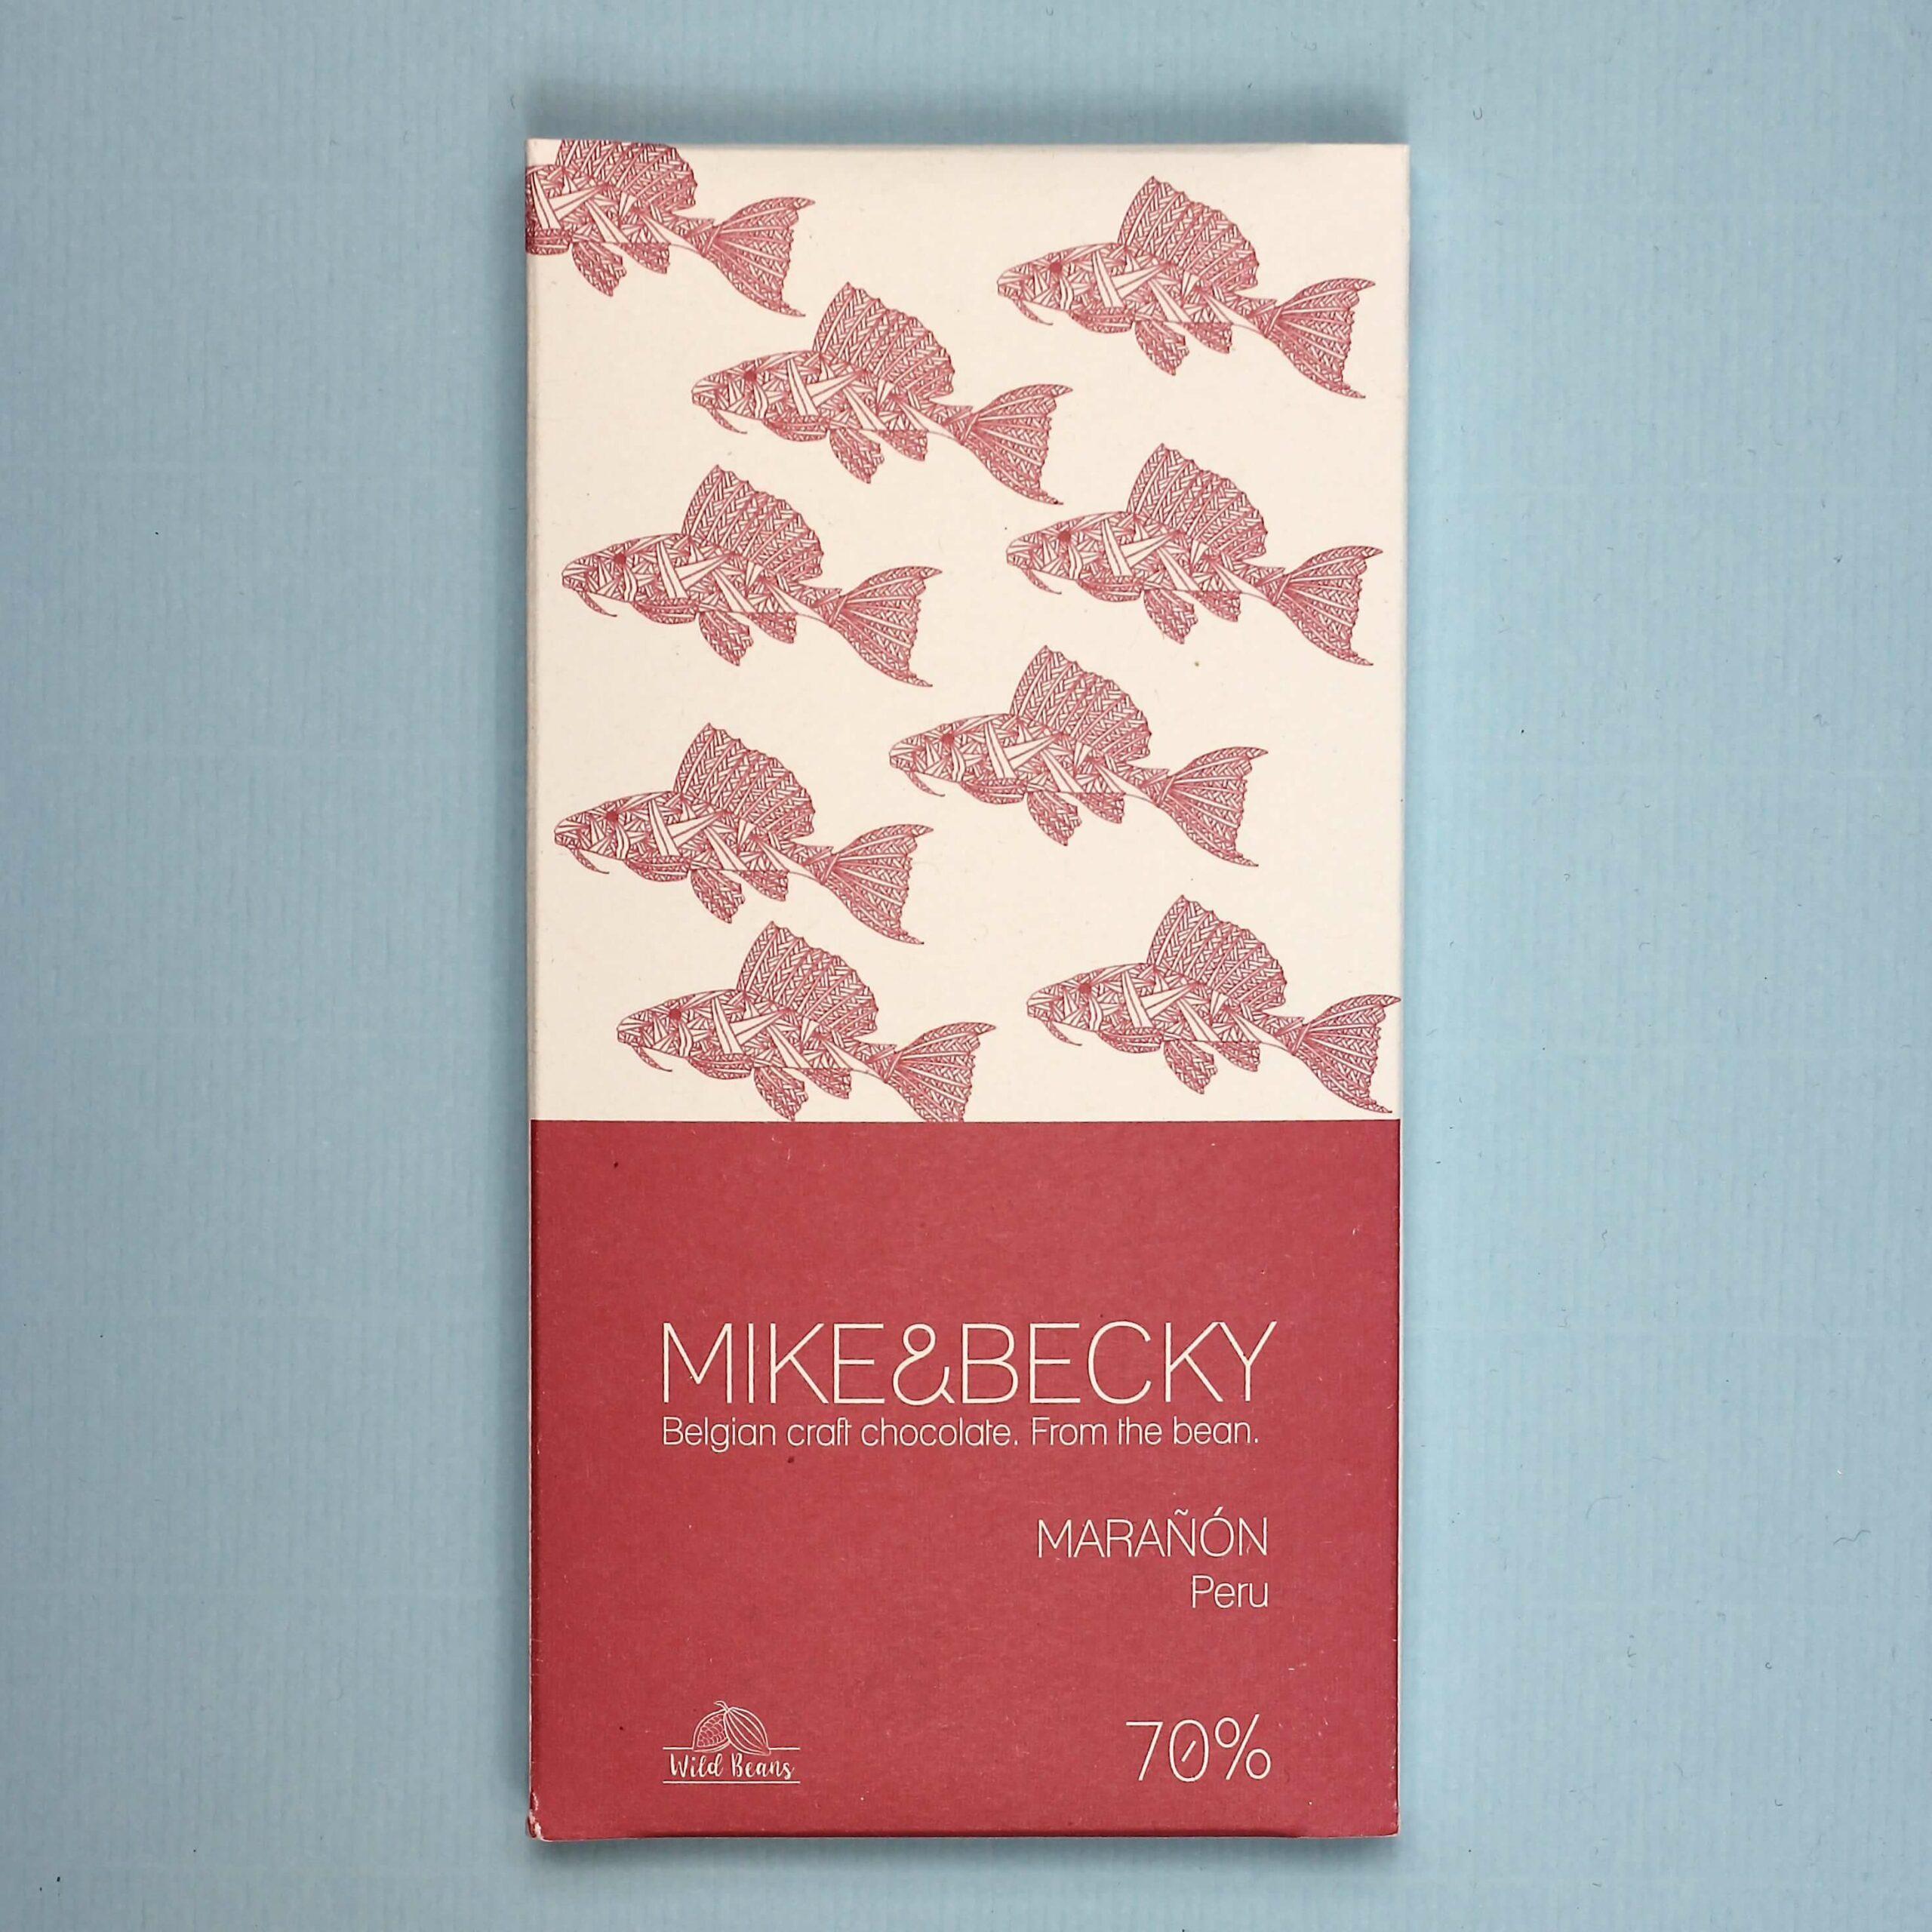 mike becky maranon peru 70